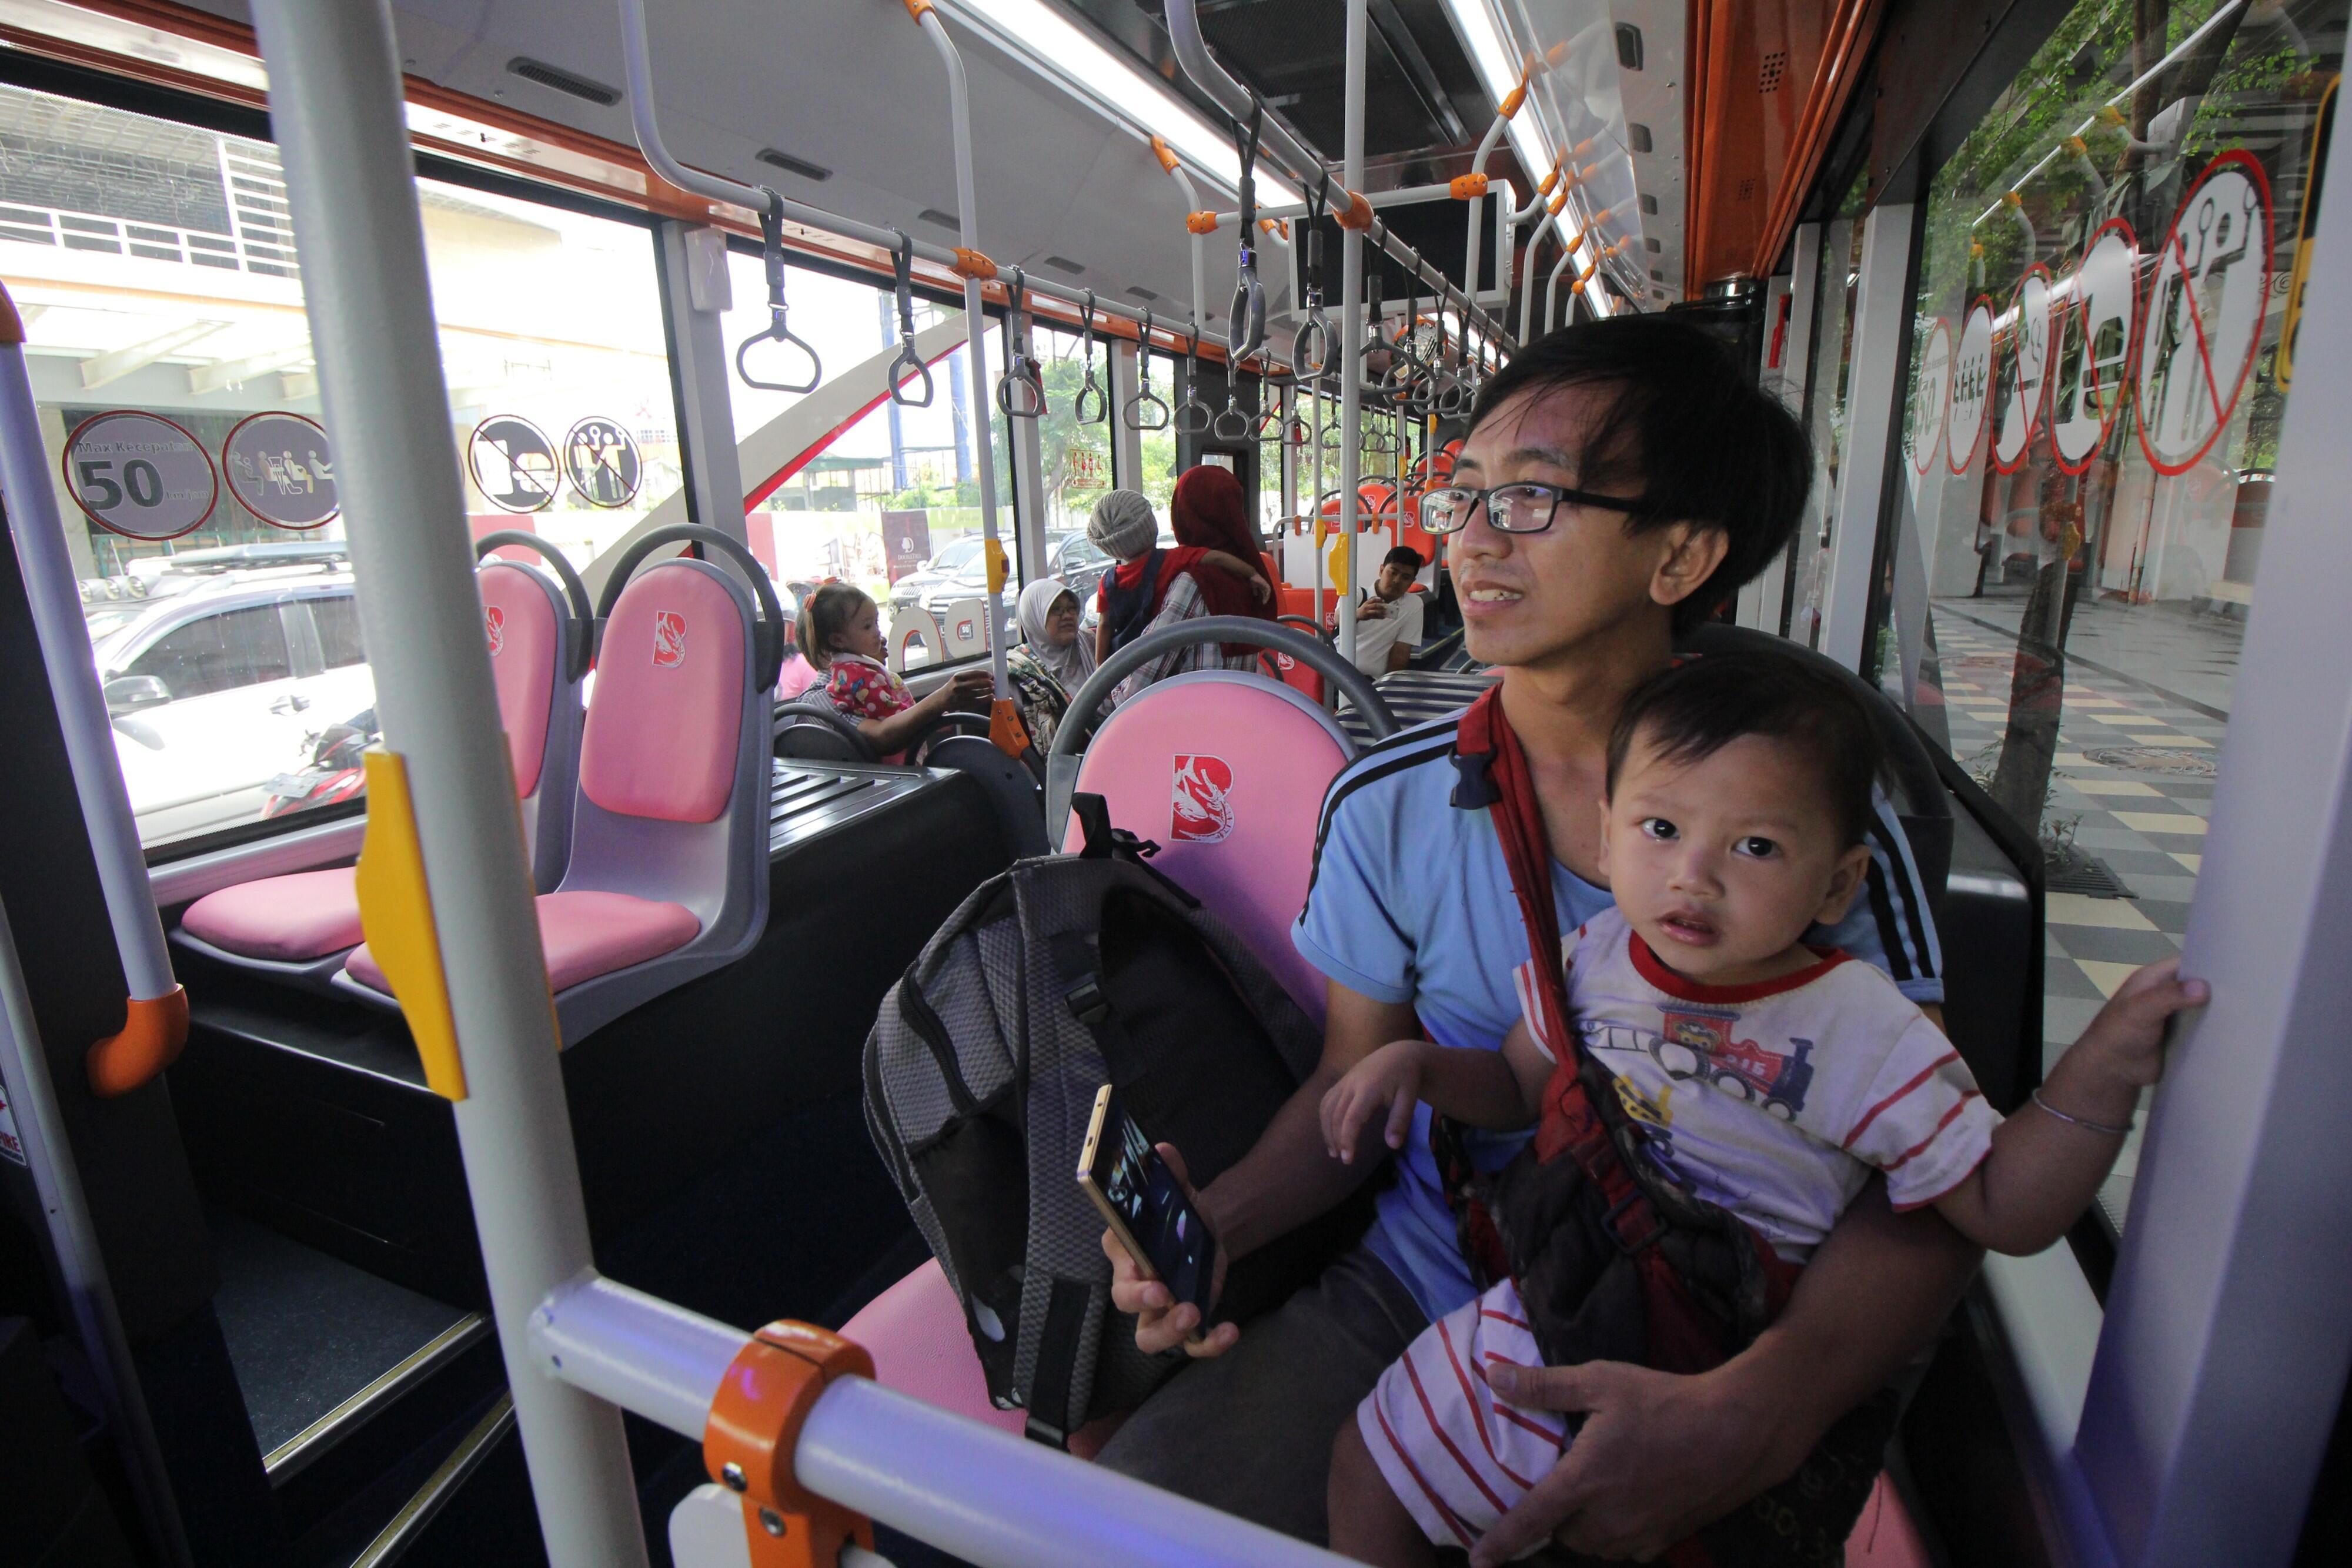 Dishub: Suroboyo Bus Aman dan Ramah untuk Kaum Difabel